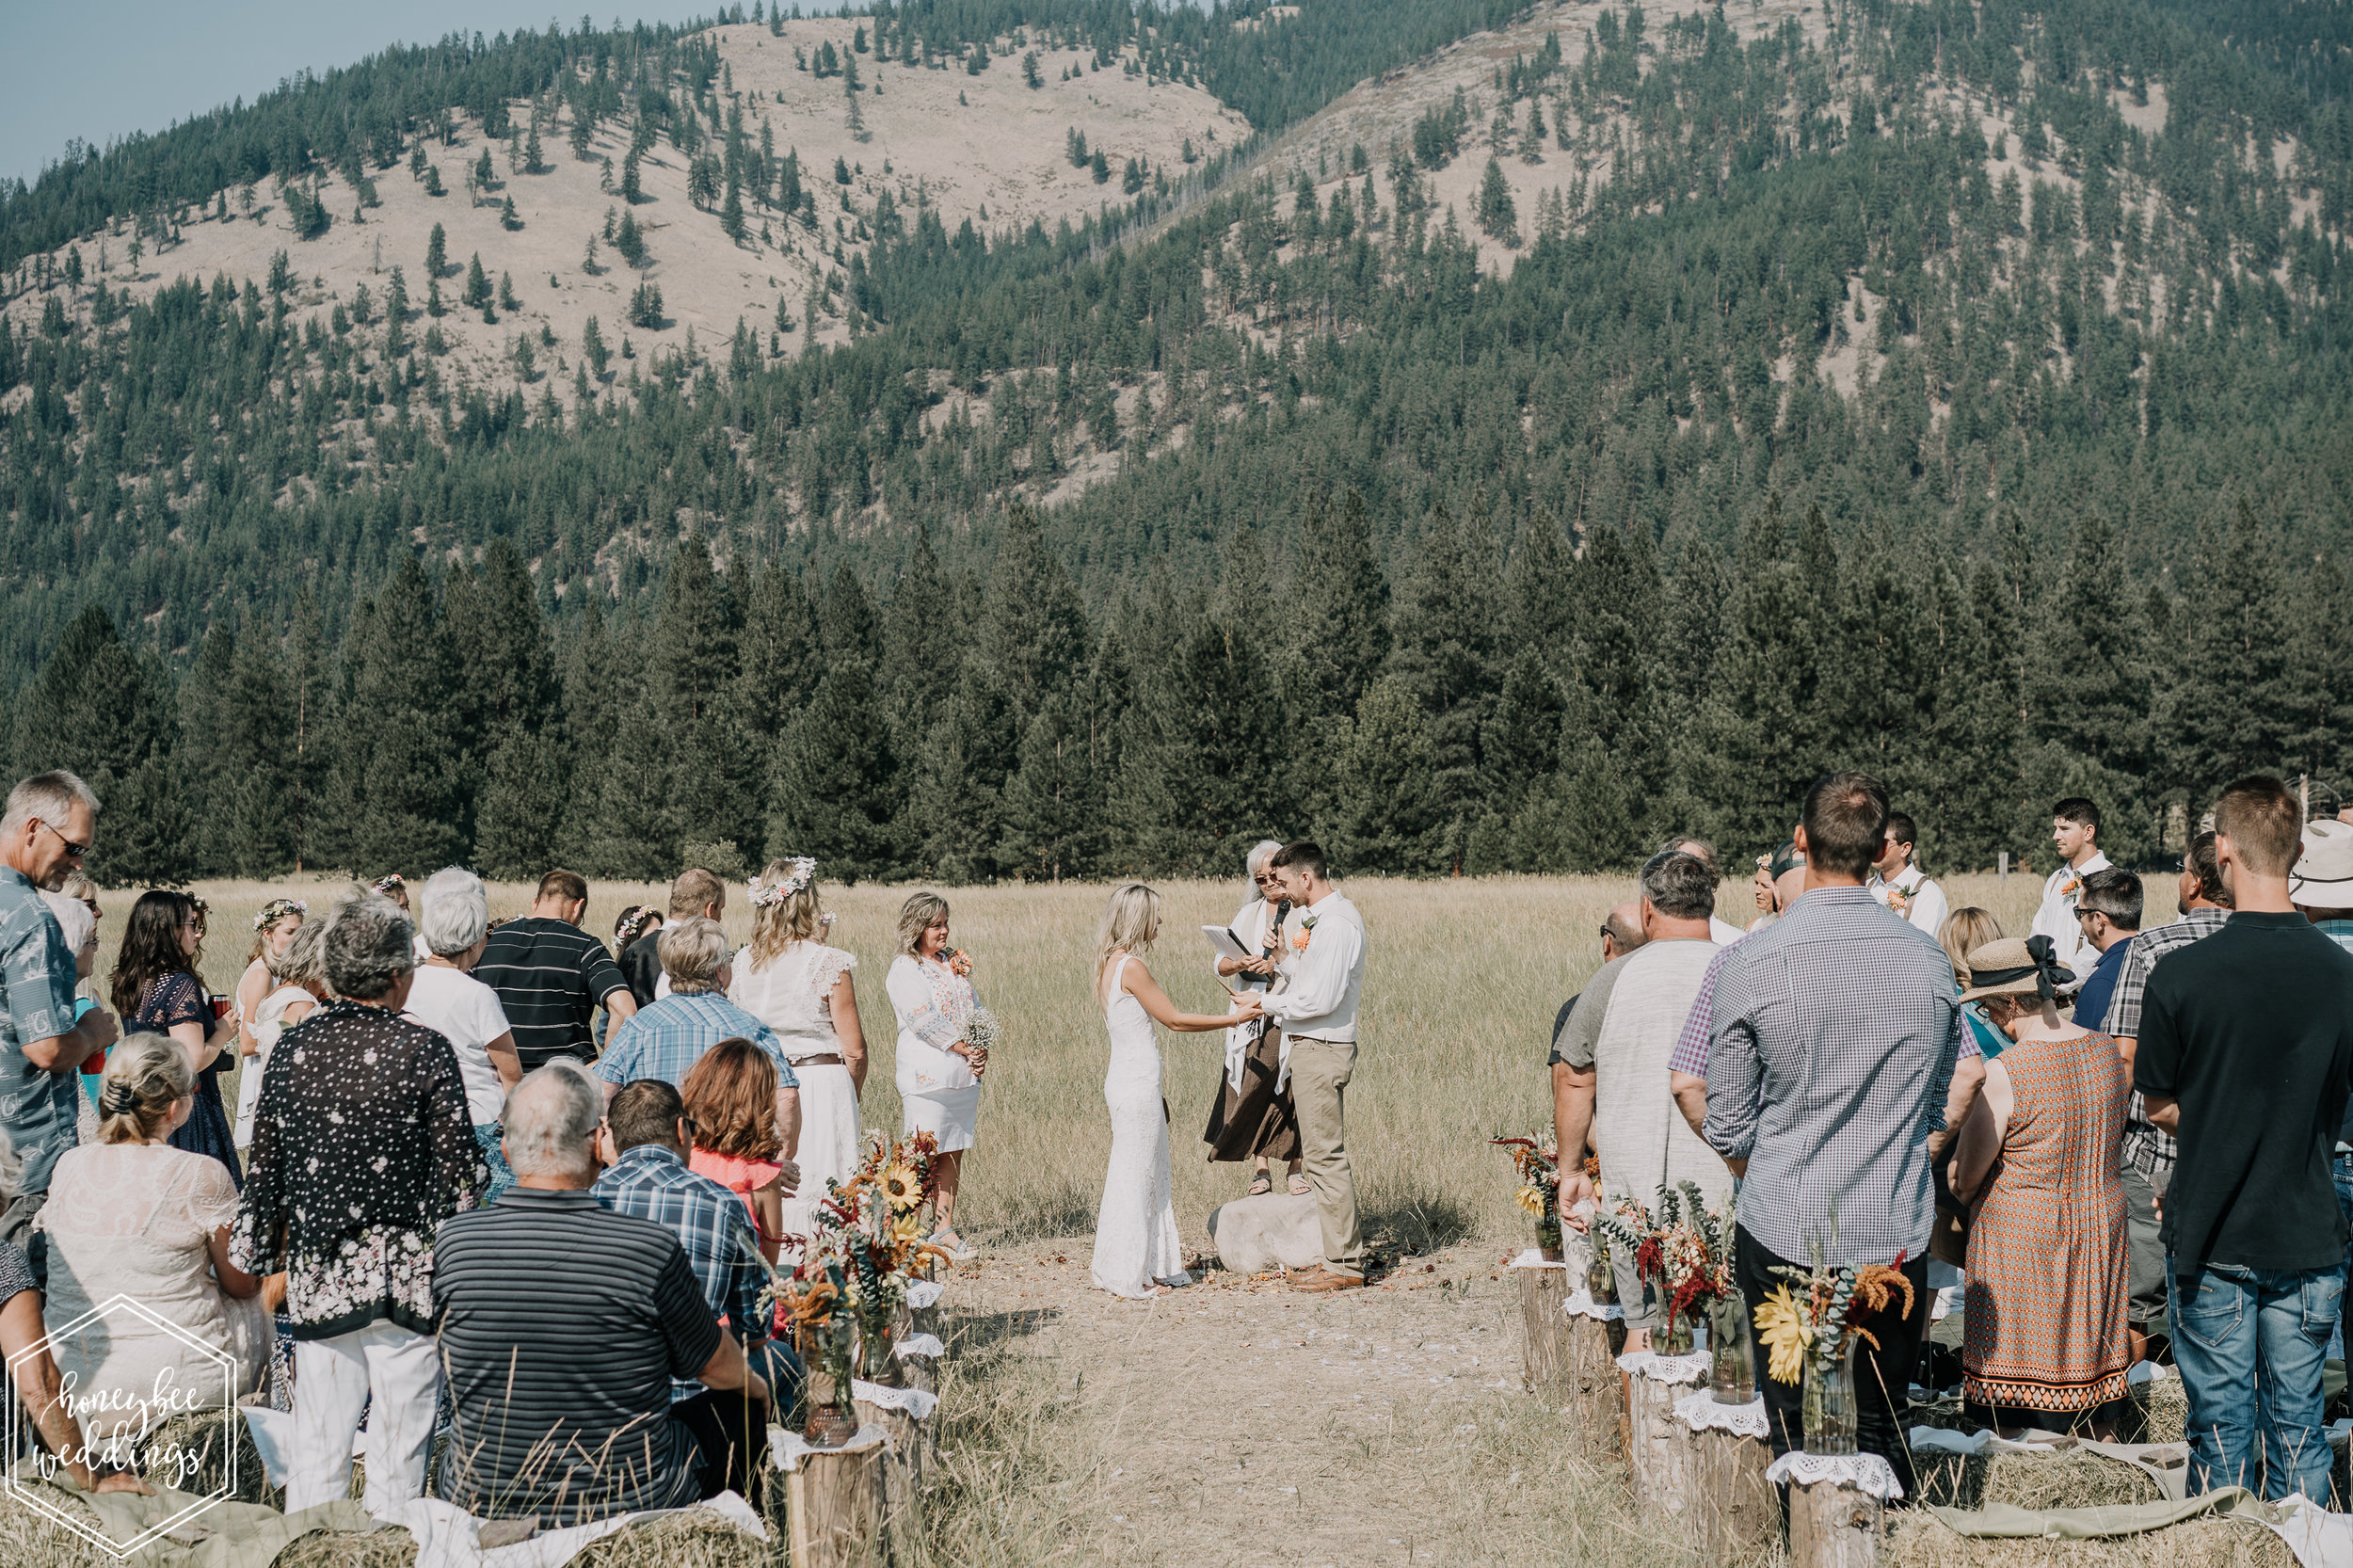 0370Alberton Wedding_Montana Wedding Photographer_Anneliesa Bashaw + Wyatt Zeylawy_August 11, 2018-842.jpg